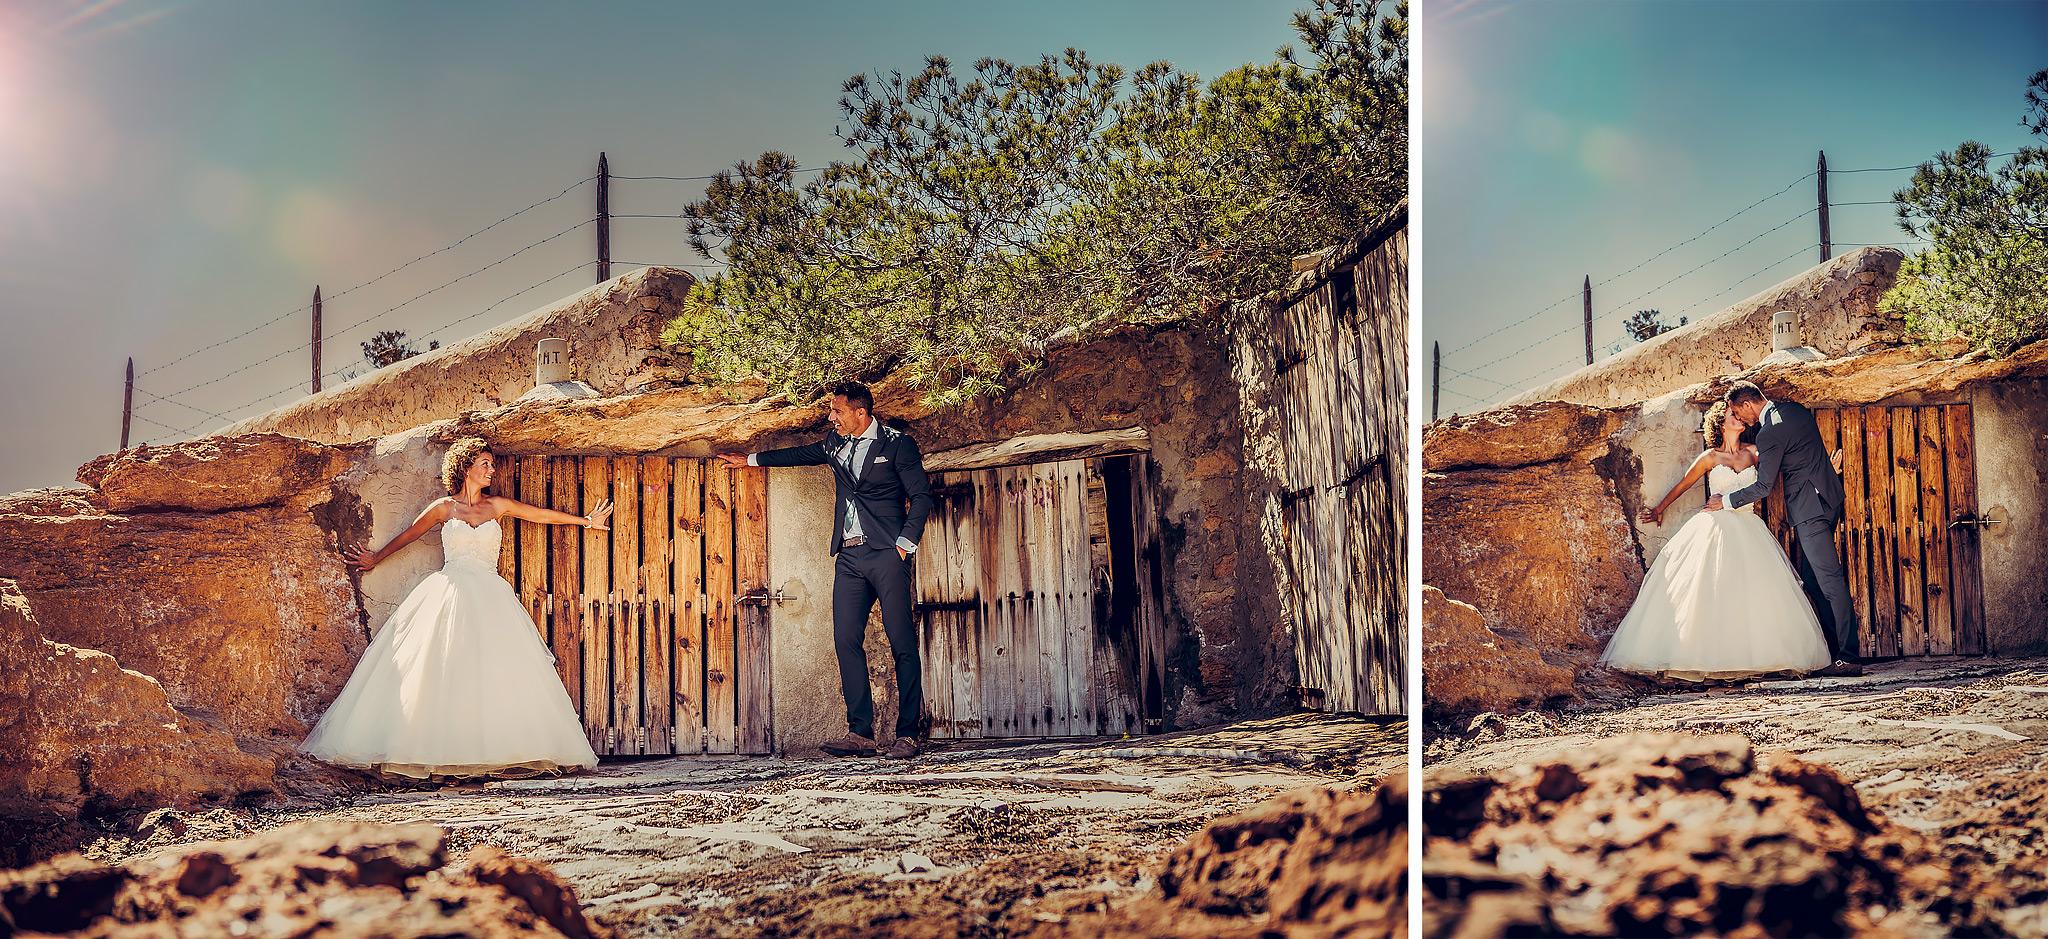 Bruidsreportage Destination Wedding Ibiza Mandy en Joost 023 - Bas Driessen Fotografie